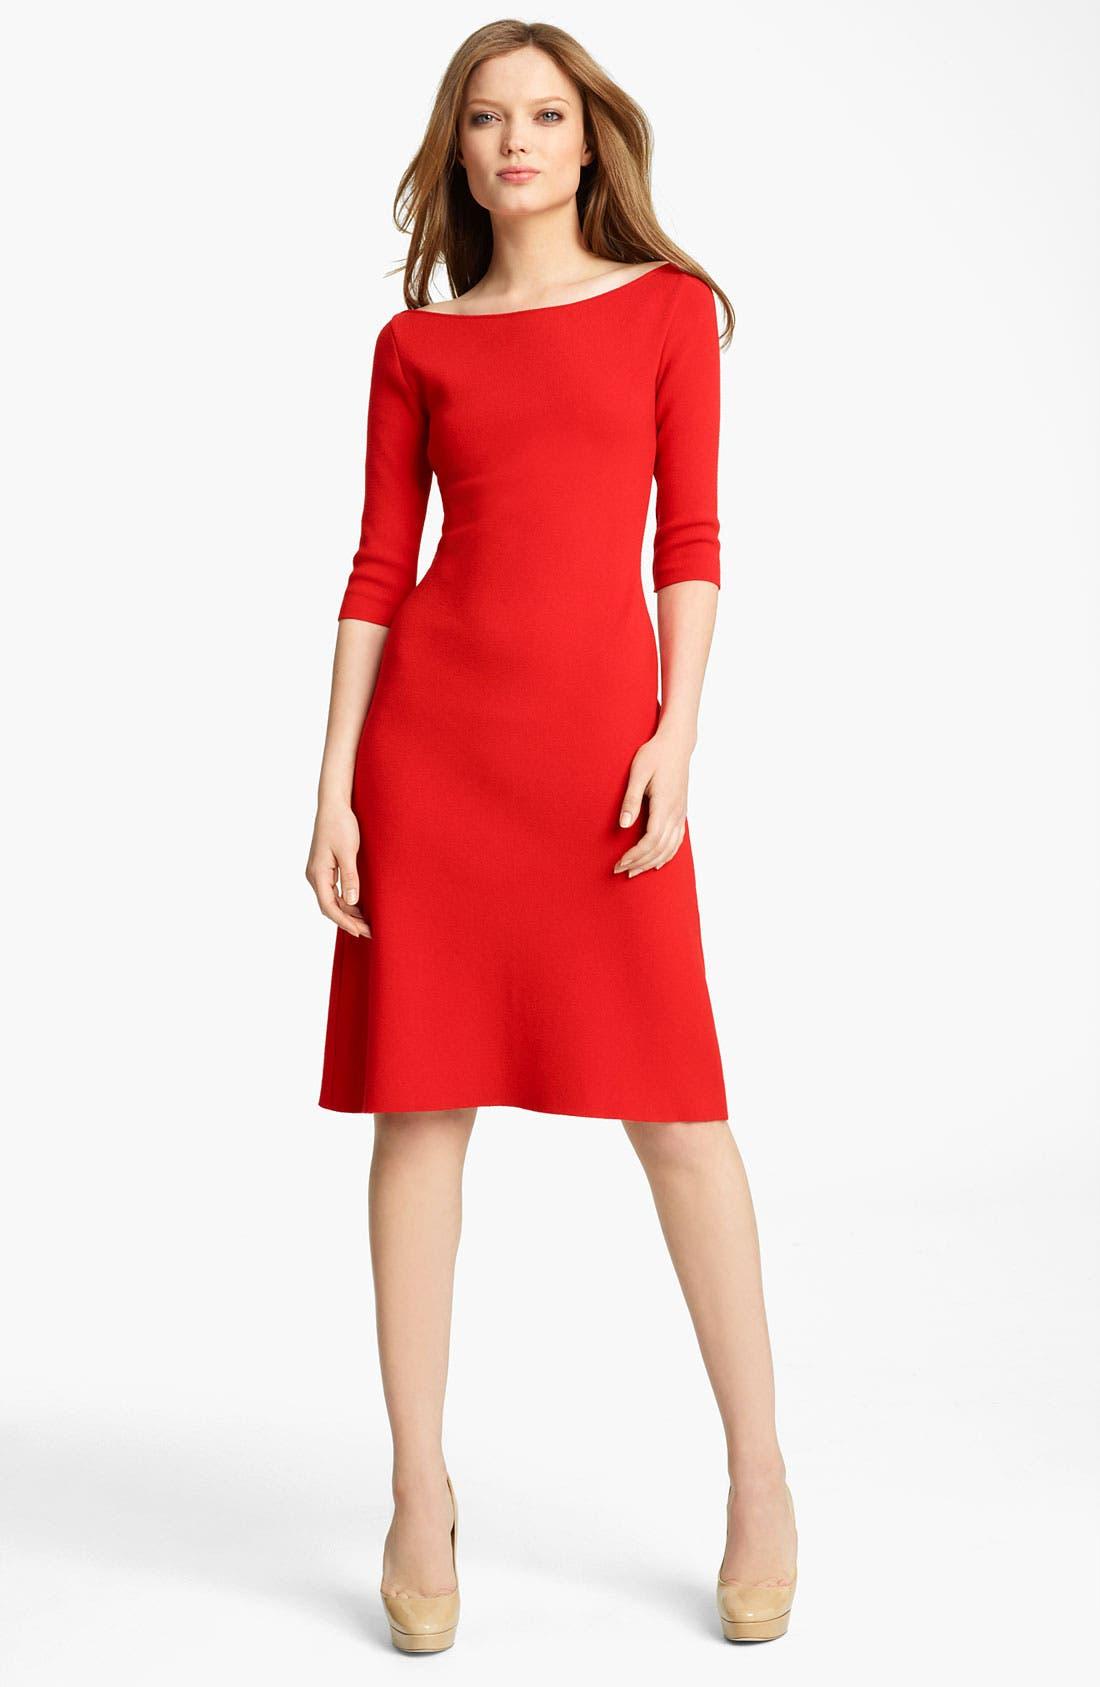 Main Image - Blumarine Sponge Knit Dress